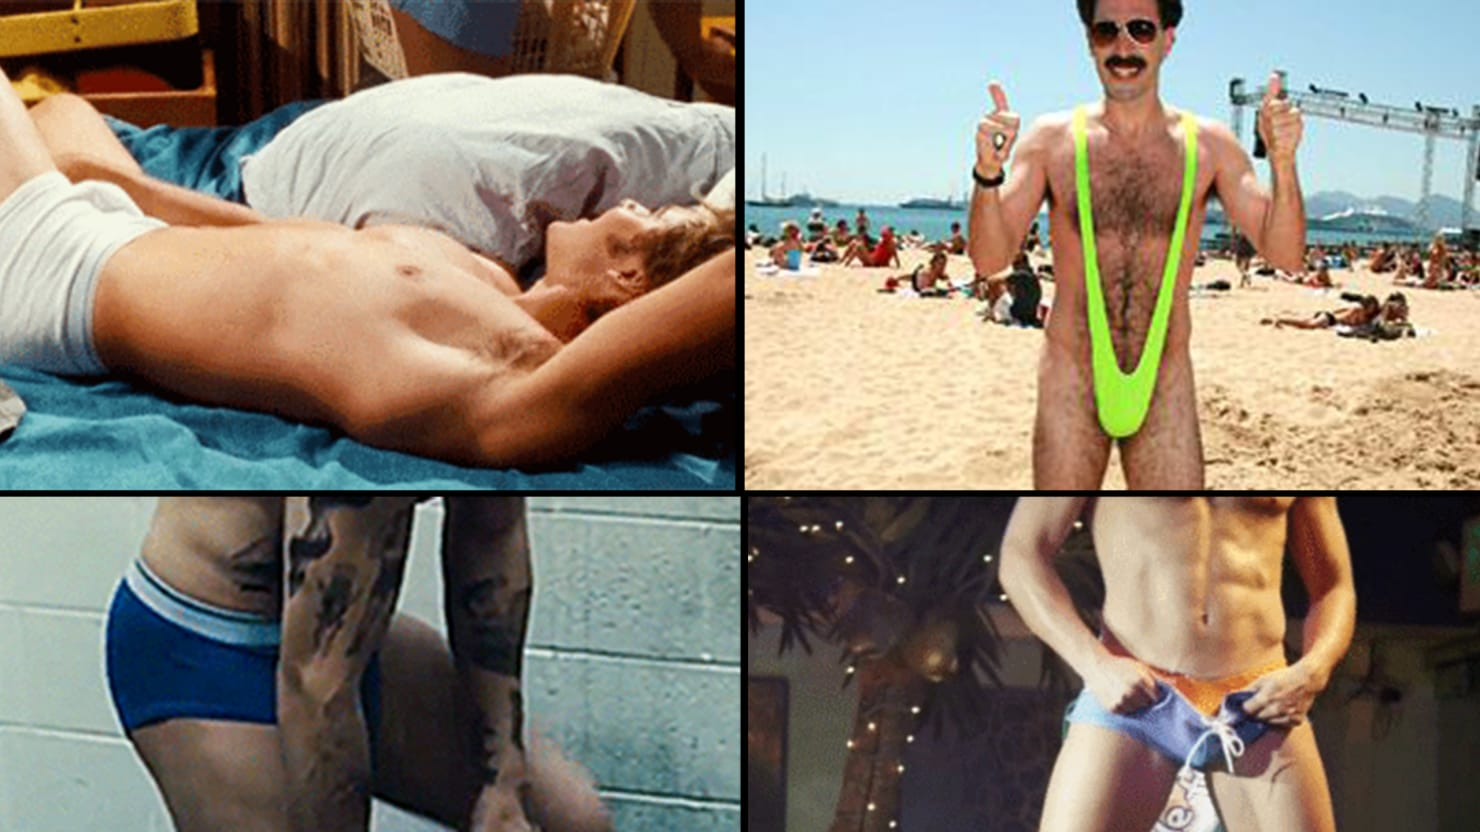 Ryan Gosling, Jon Hamm, Zac Efron & More of the Best On-Screen Bulges